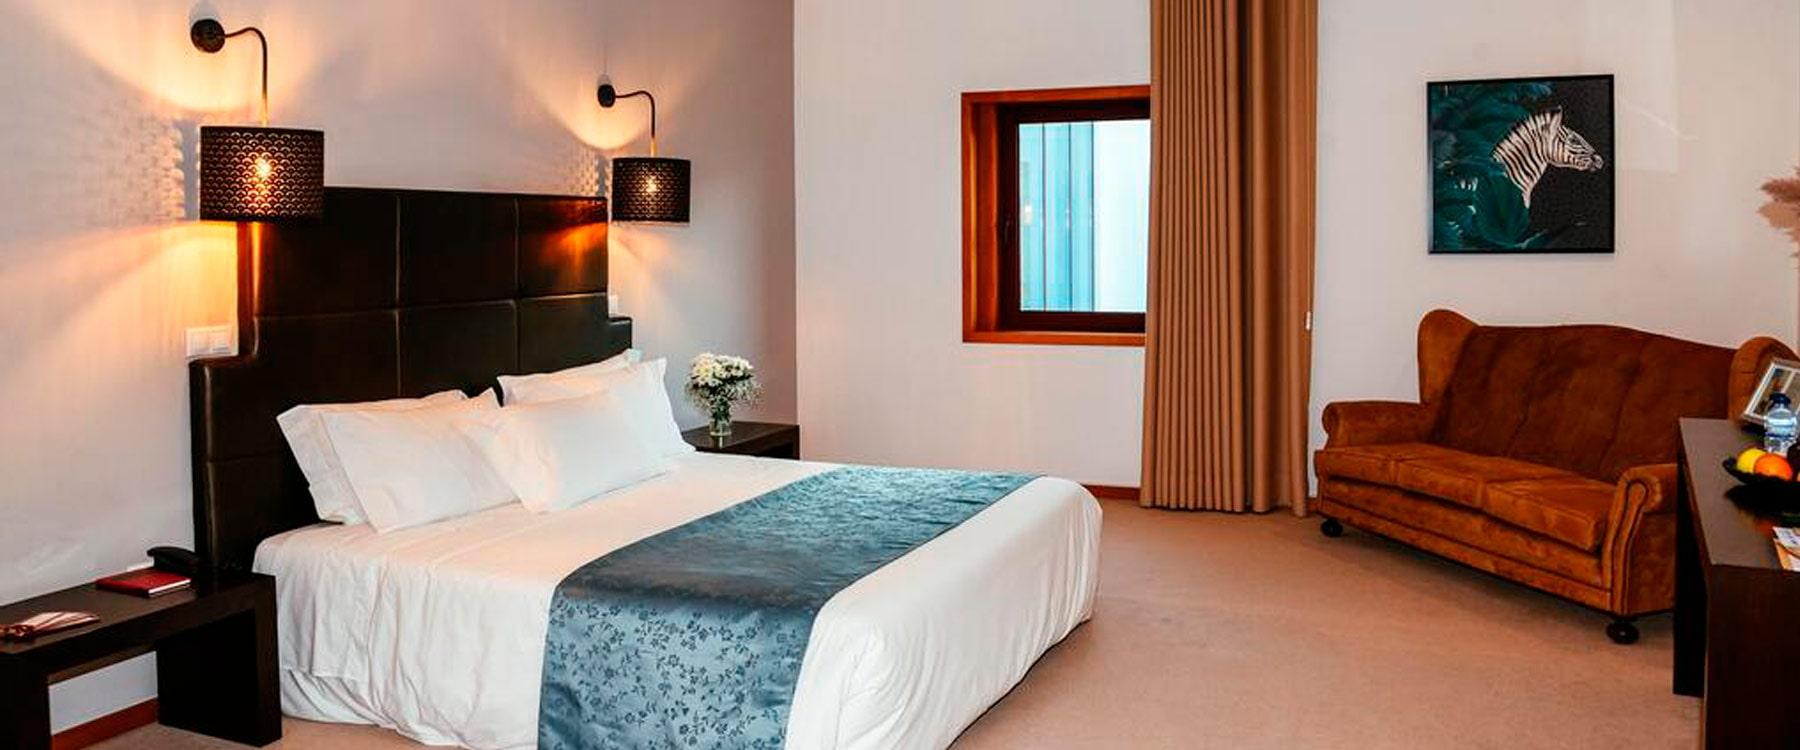 santo_thyrso_hotel_banner-min